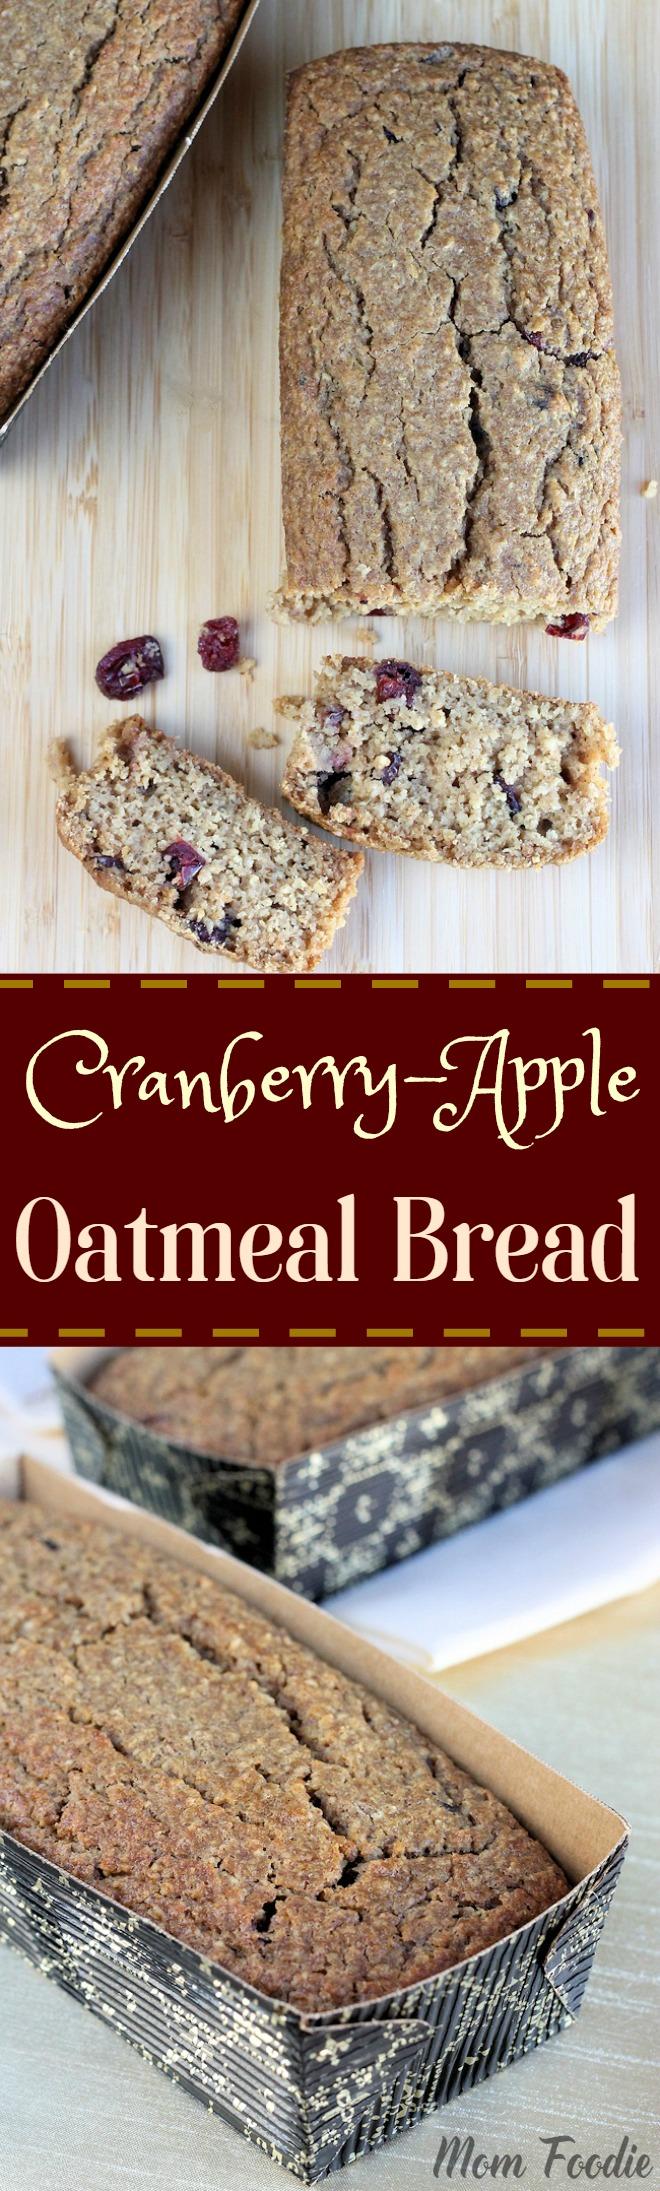 Cranberry Apple Oatmeal Bread